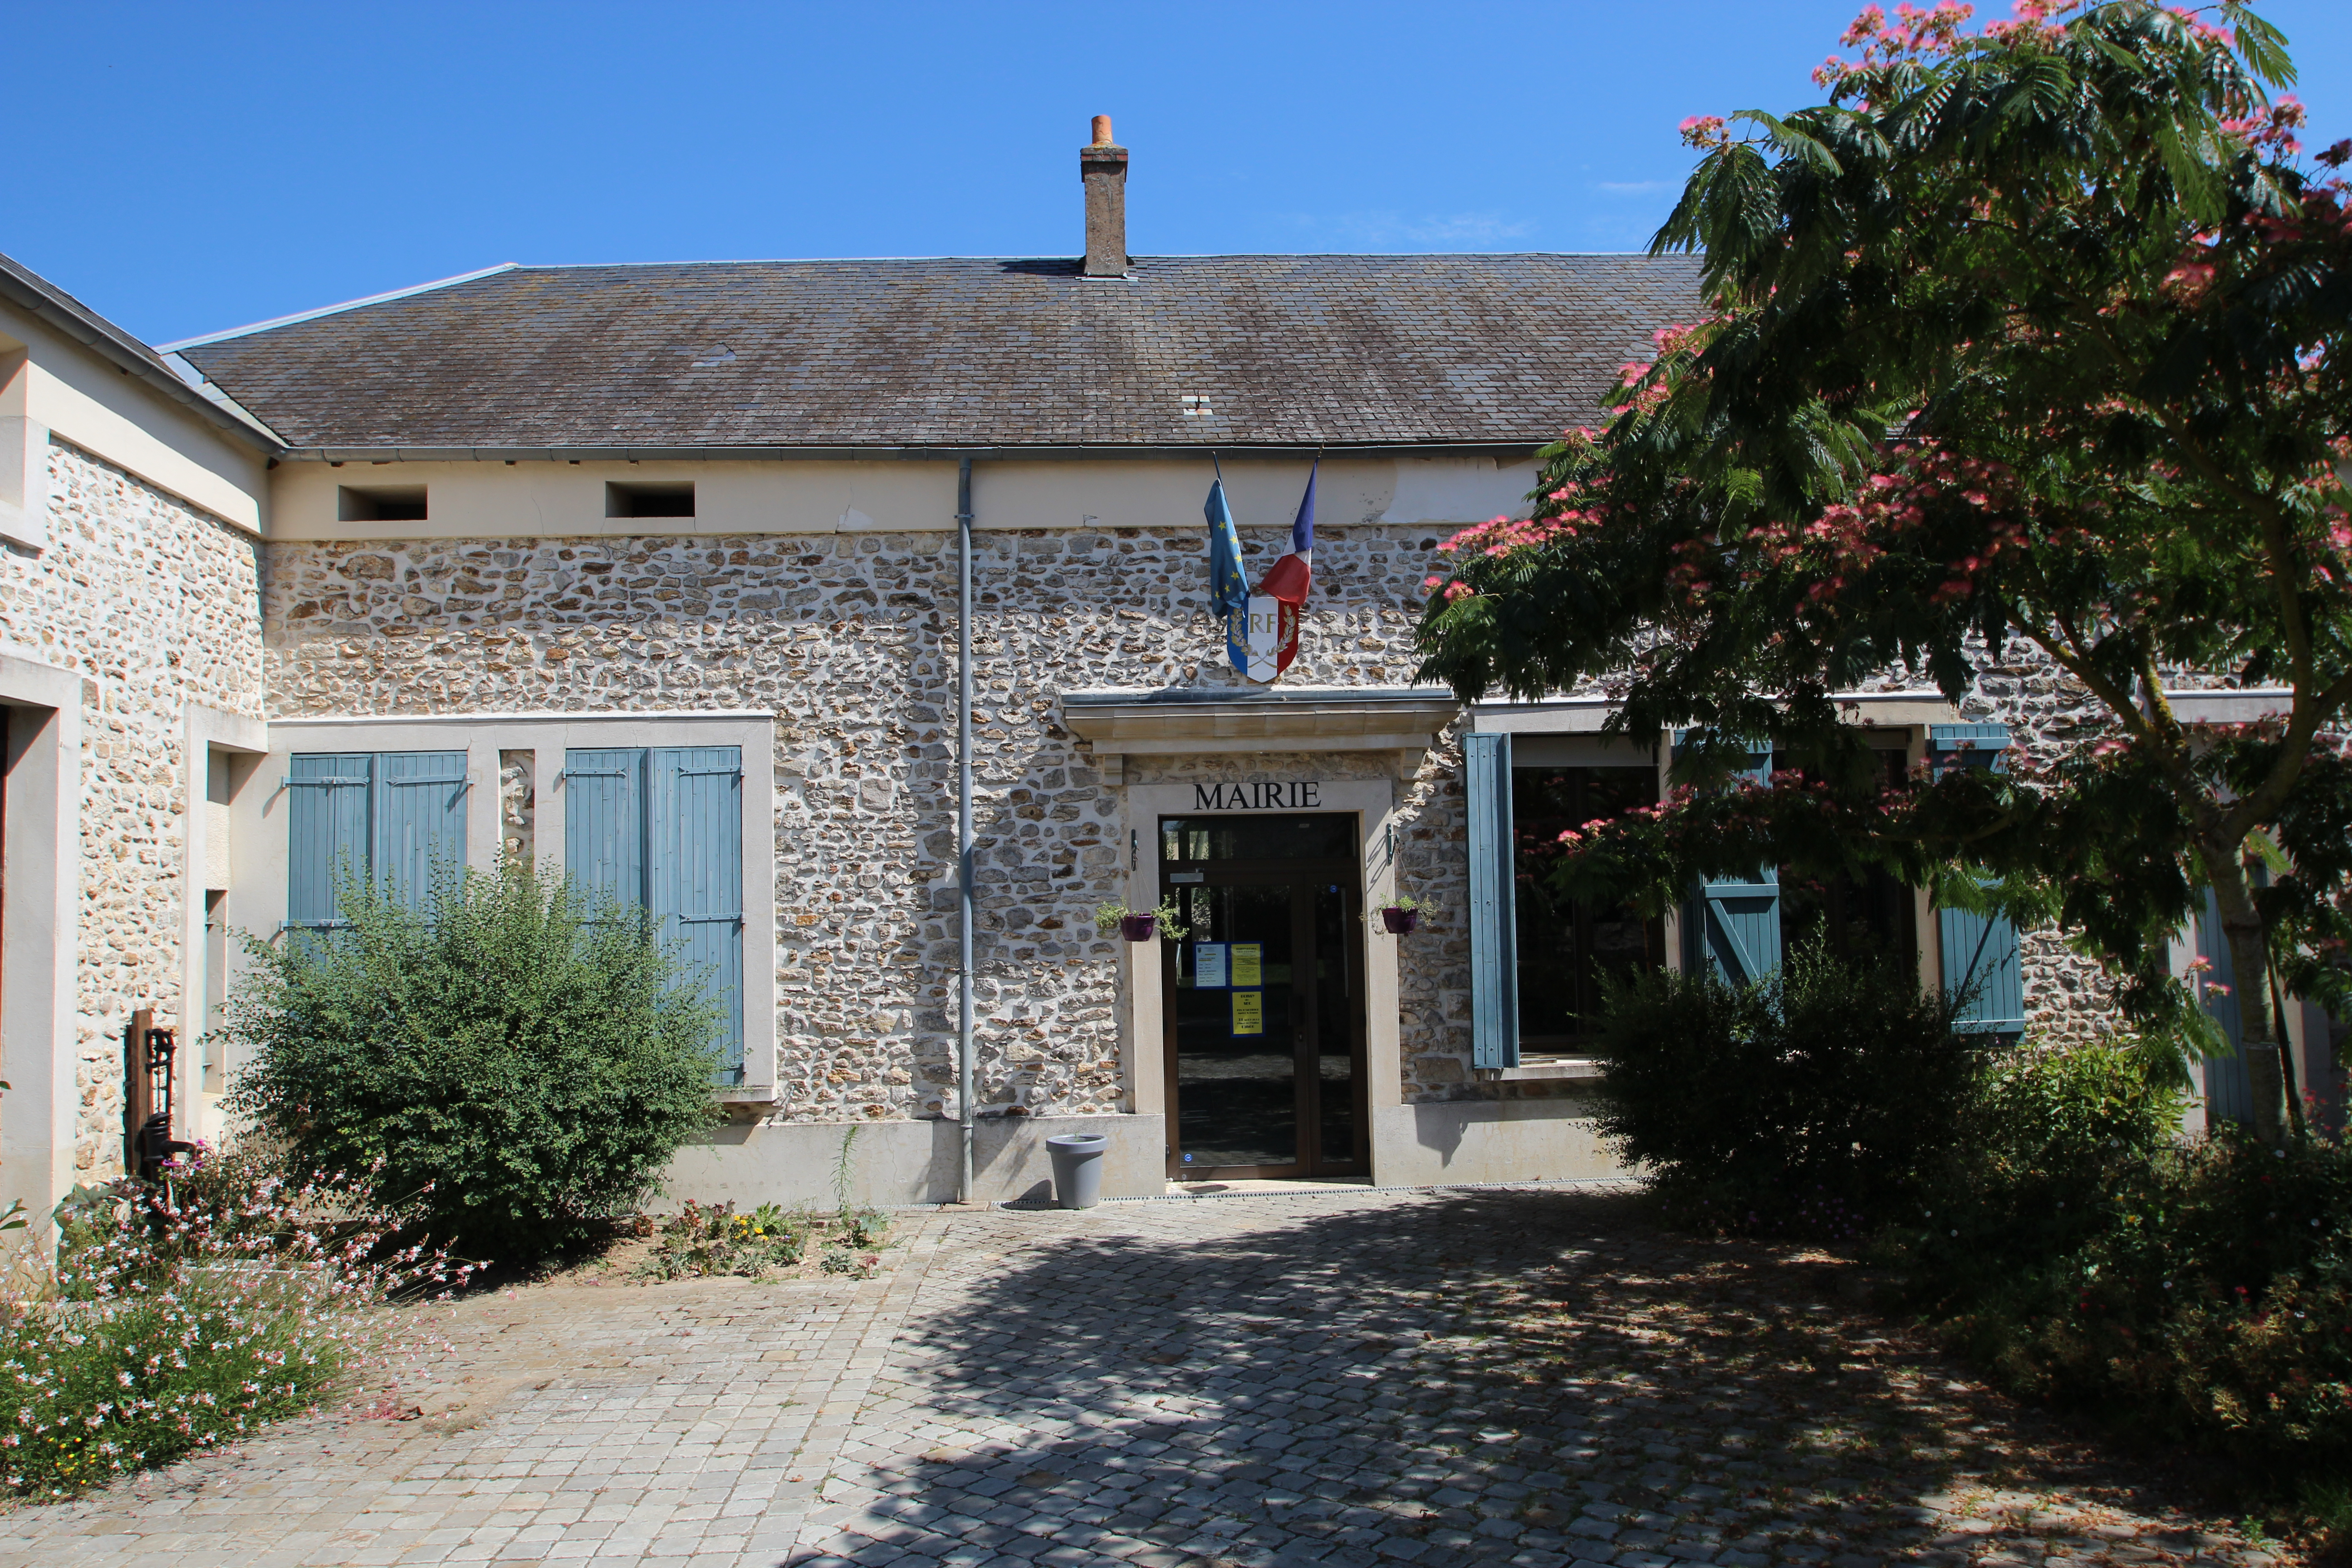 Boissy-le-Sec